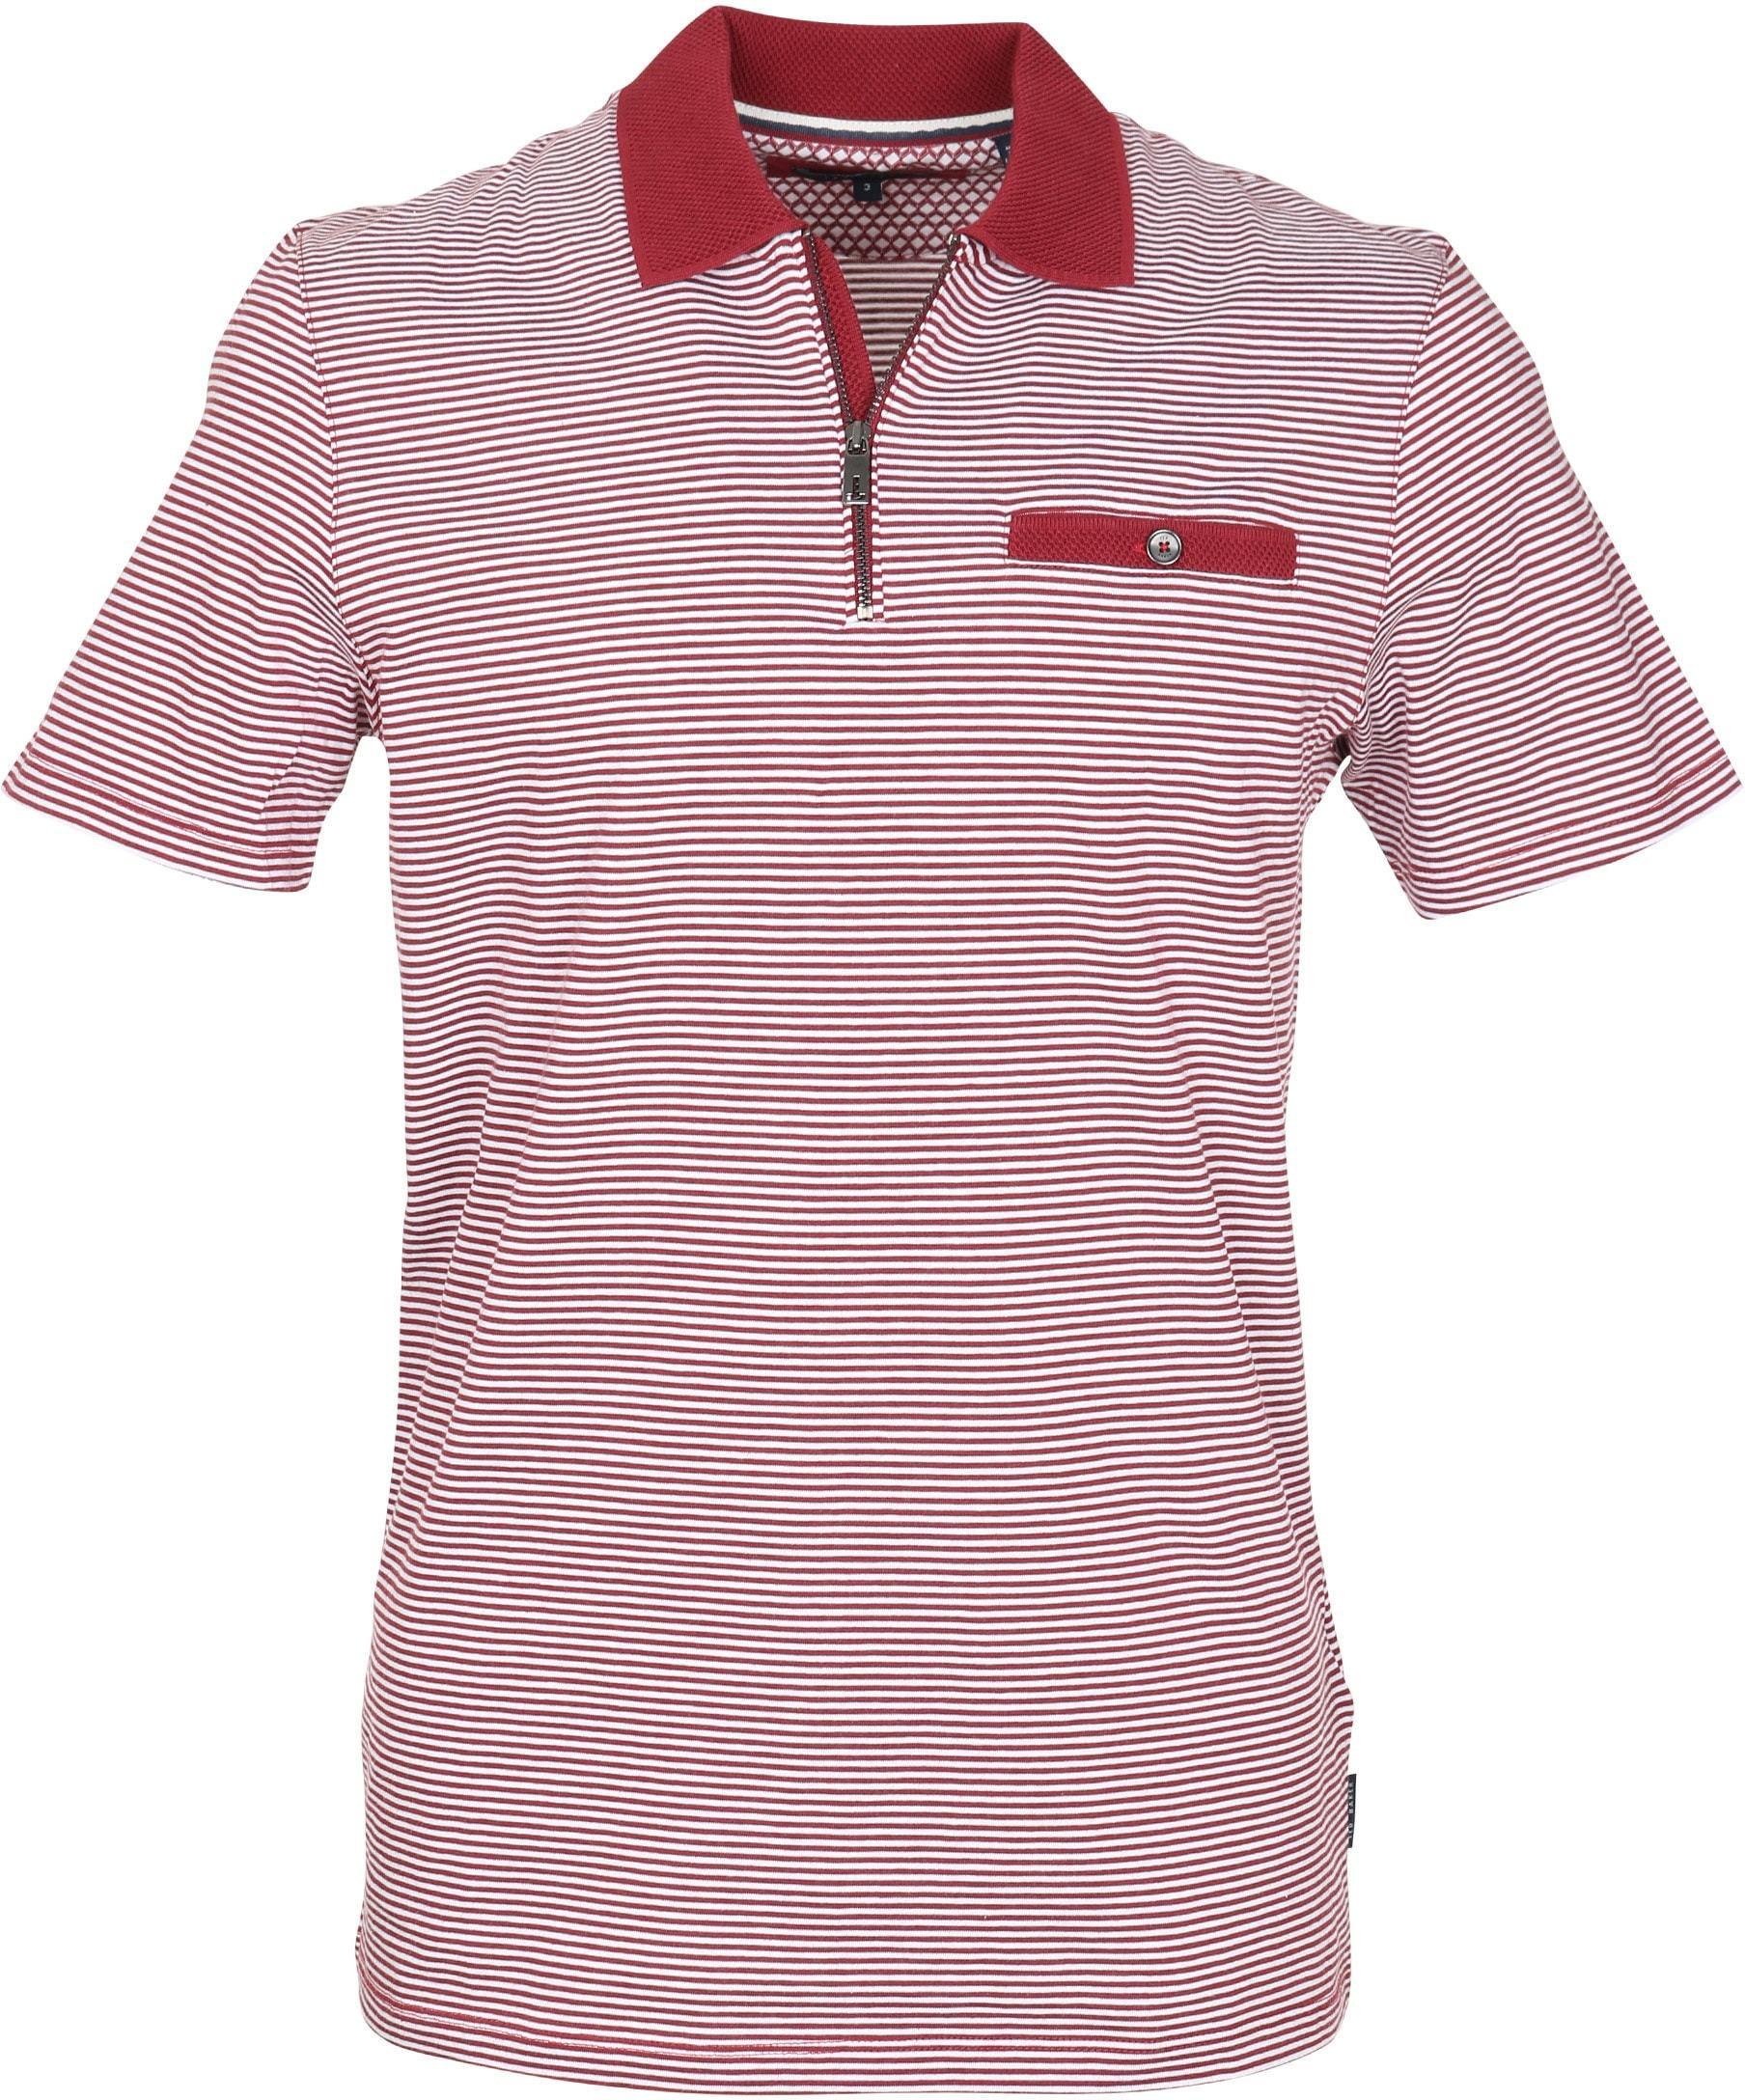 7a98ef604eea0 Ted Baker Poloshirt Stripes Red 143617-40 order online